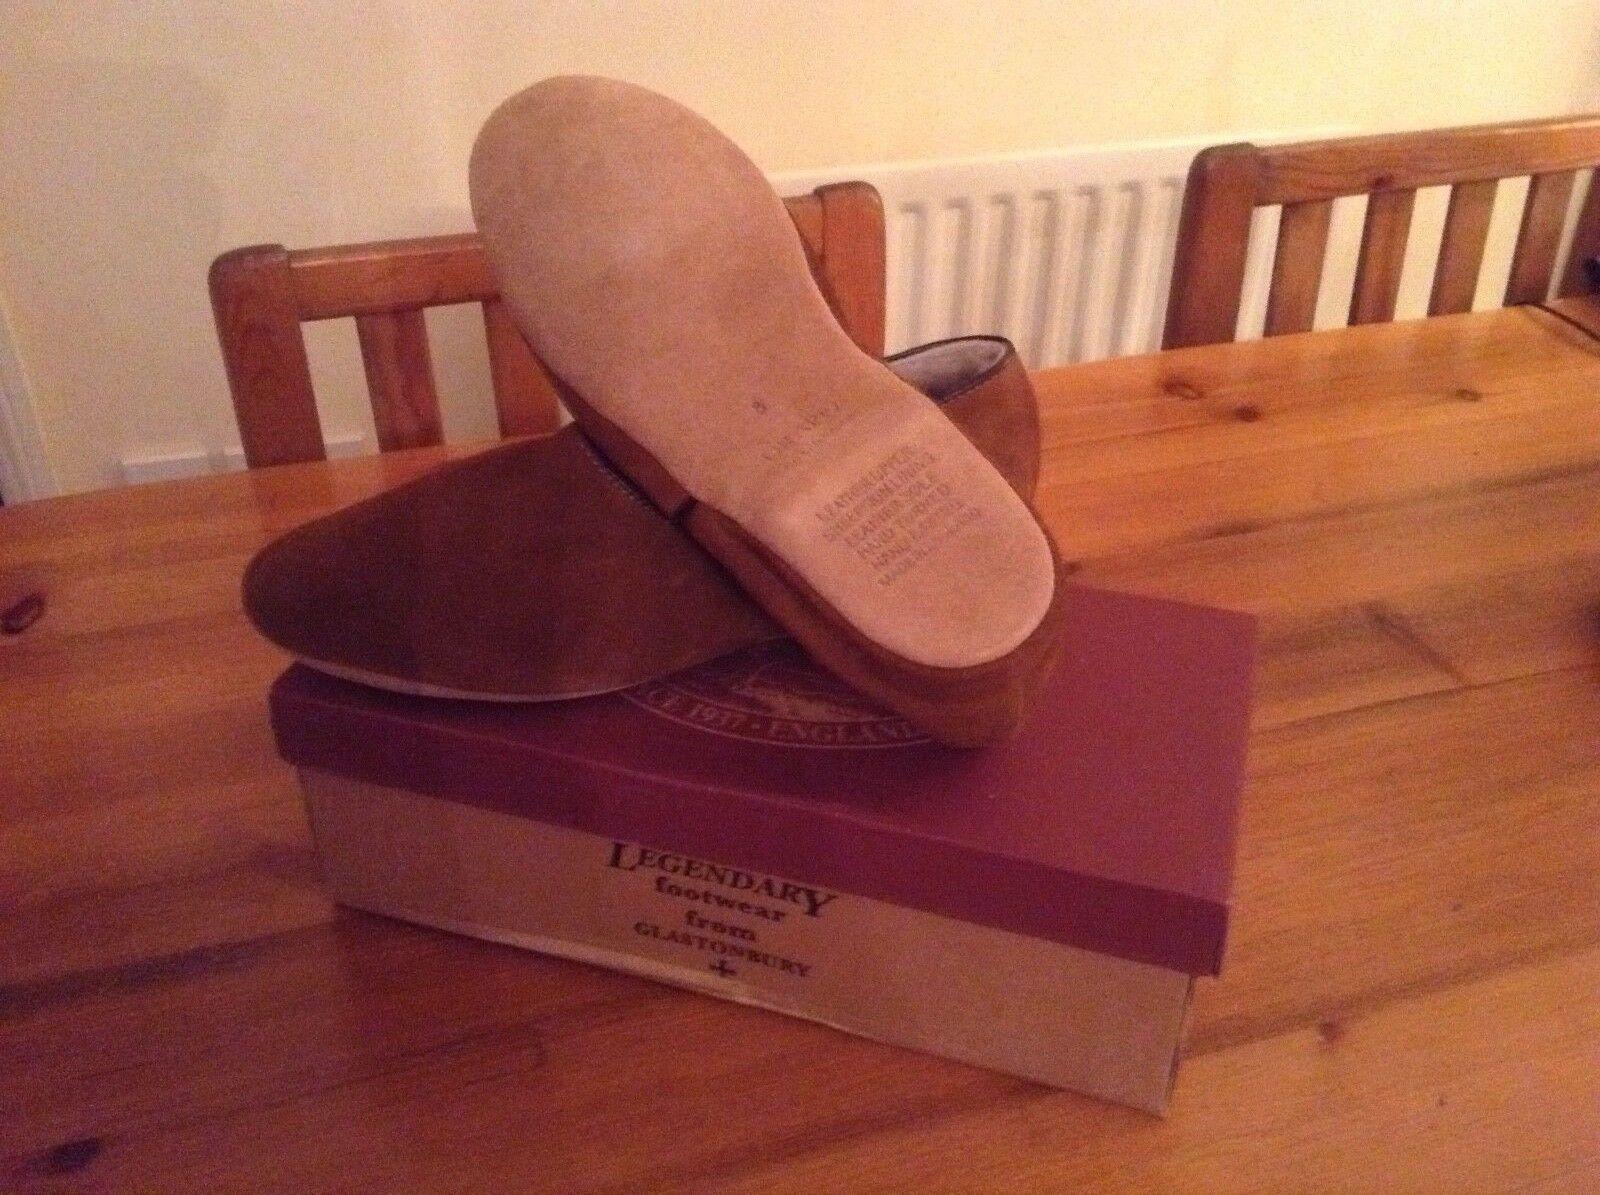 Drapers of Glastonbury ANTON Sheepskin slippers in Mocca   7-11